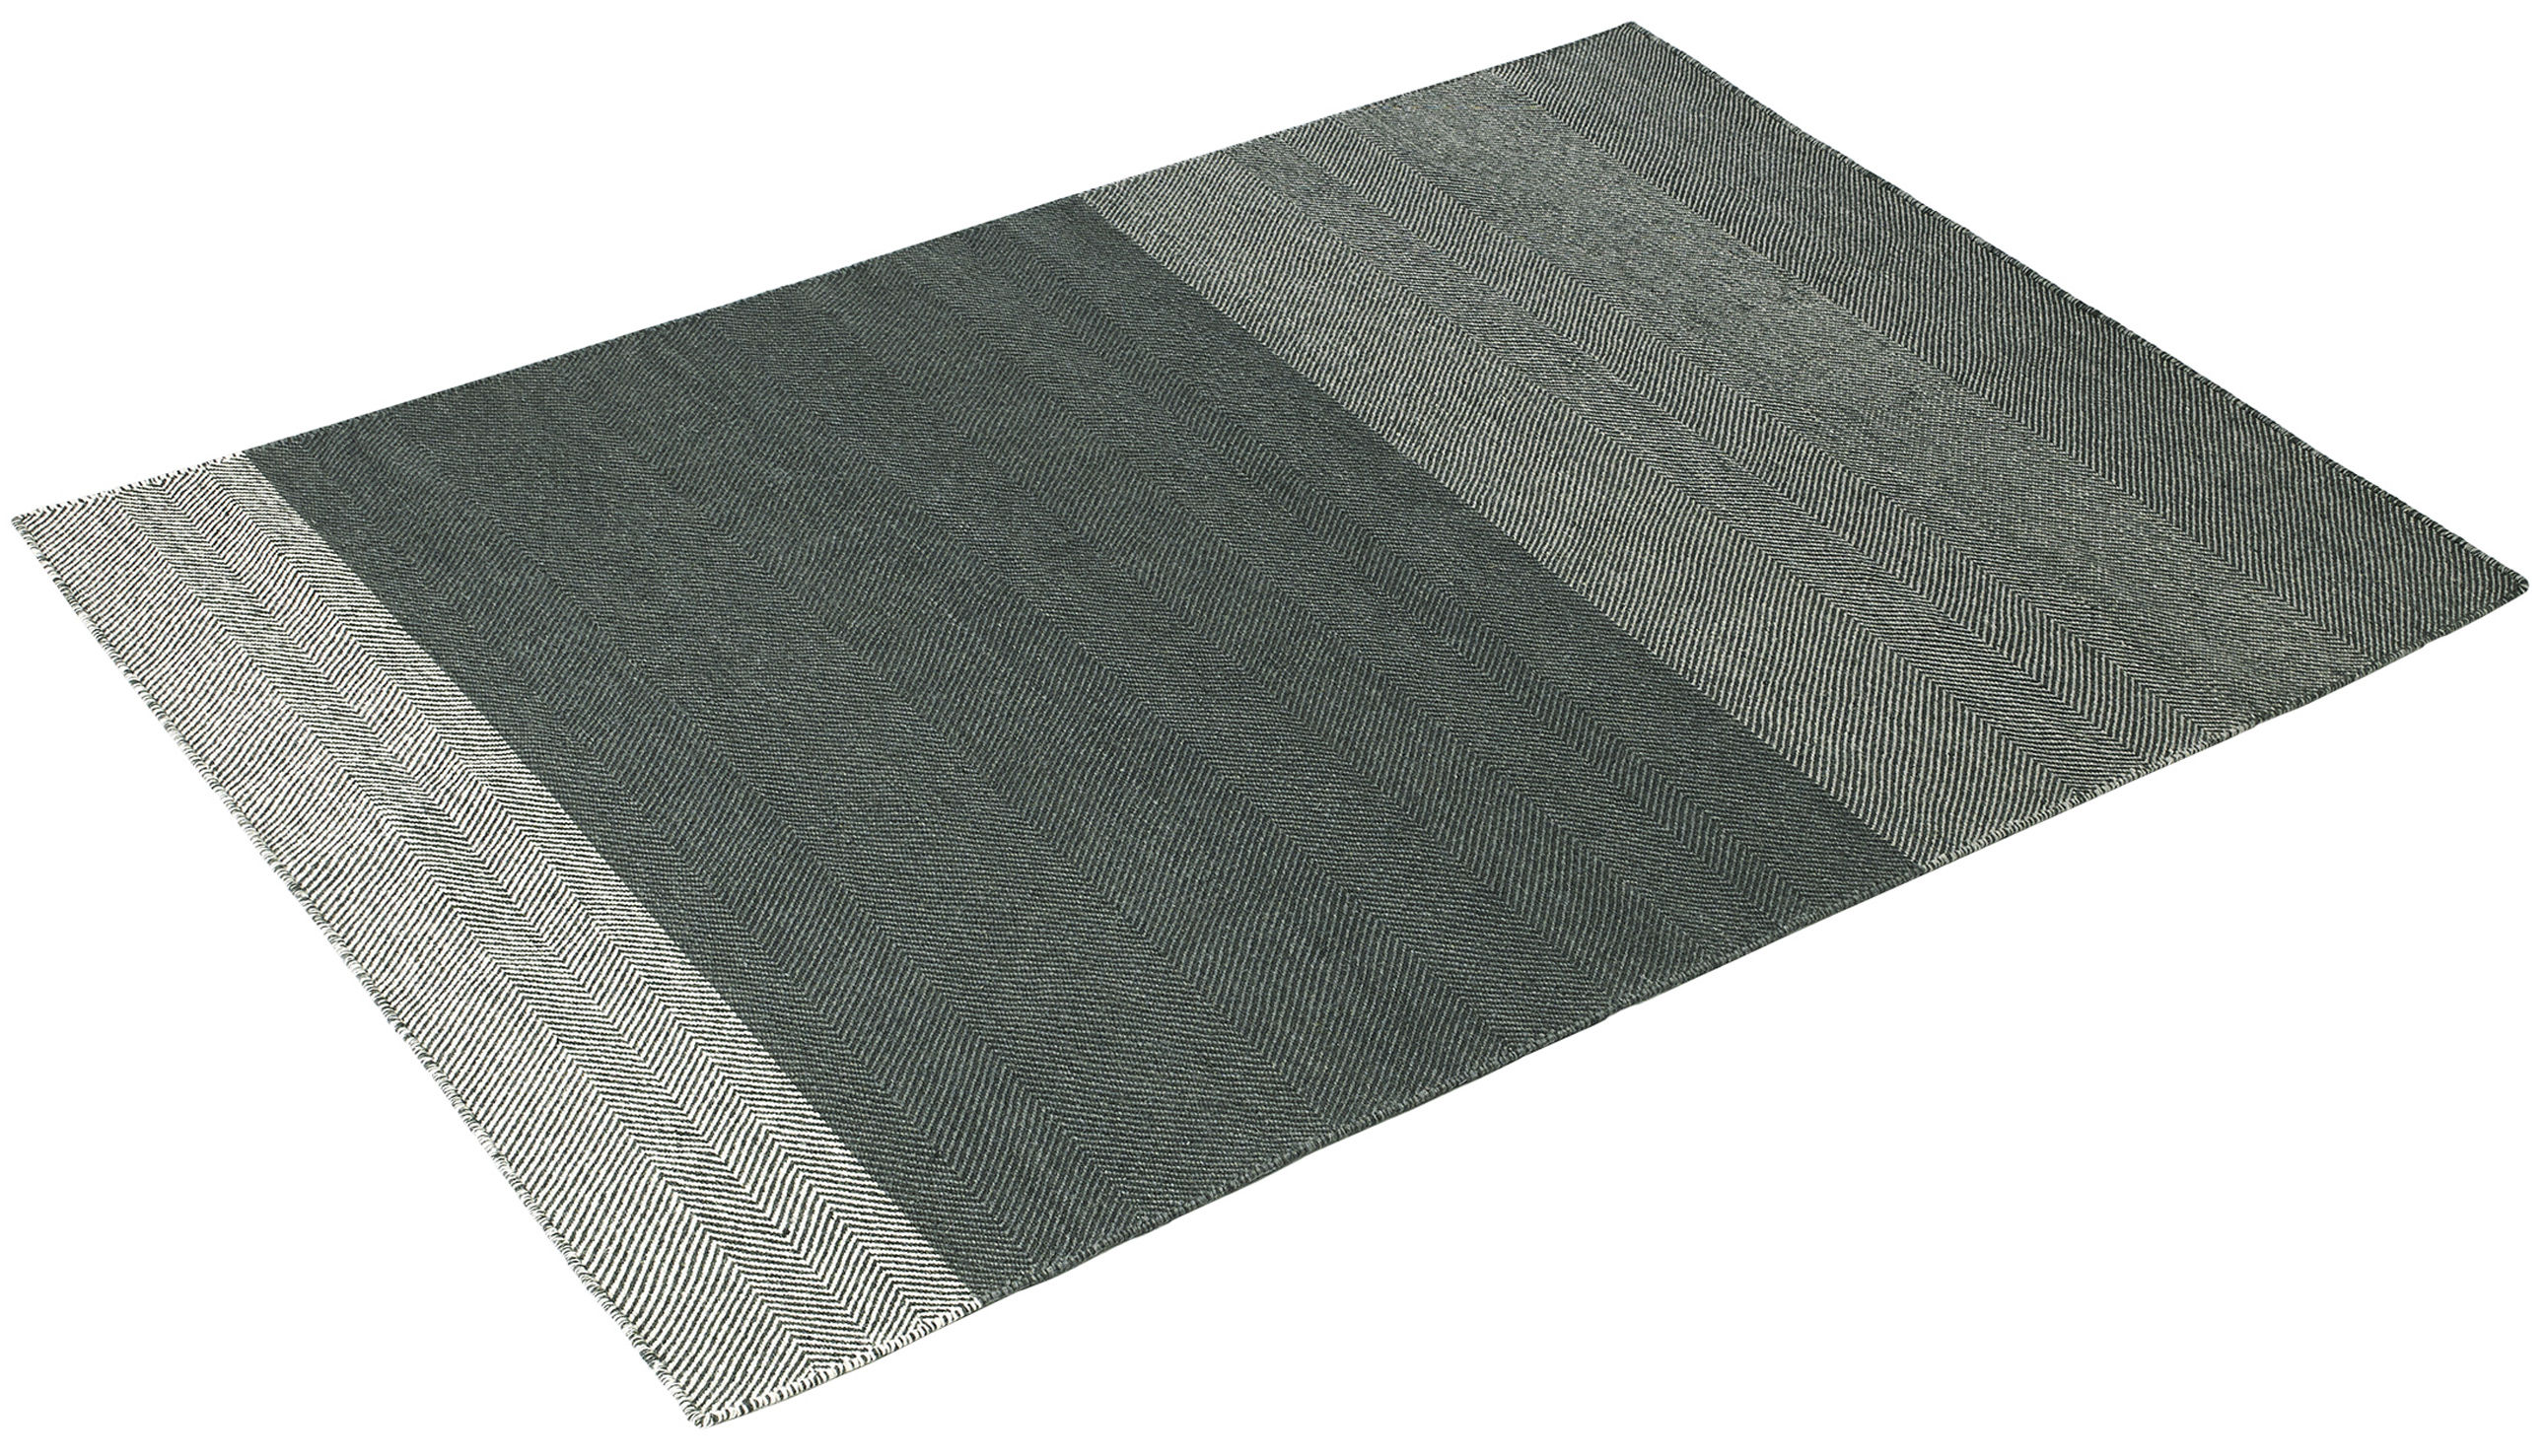 varjo 200 x 300 cm muuto teppich. Black Bedroom Furniture Sets. Home Design Ideas